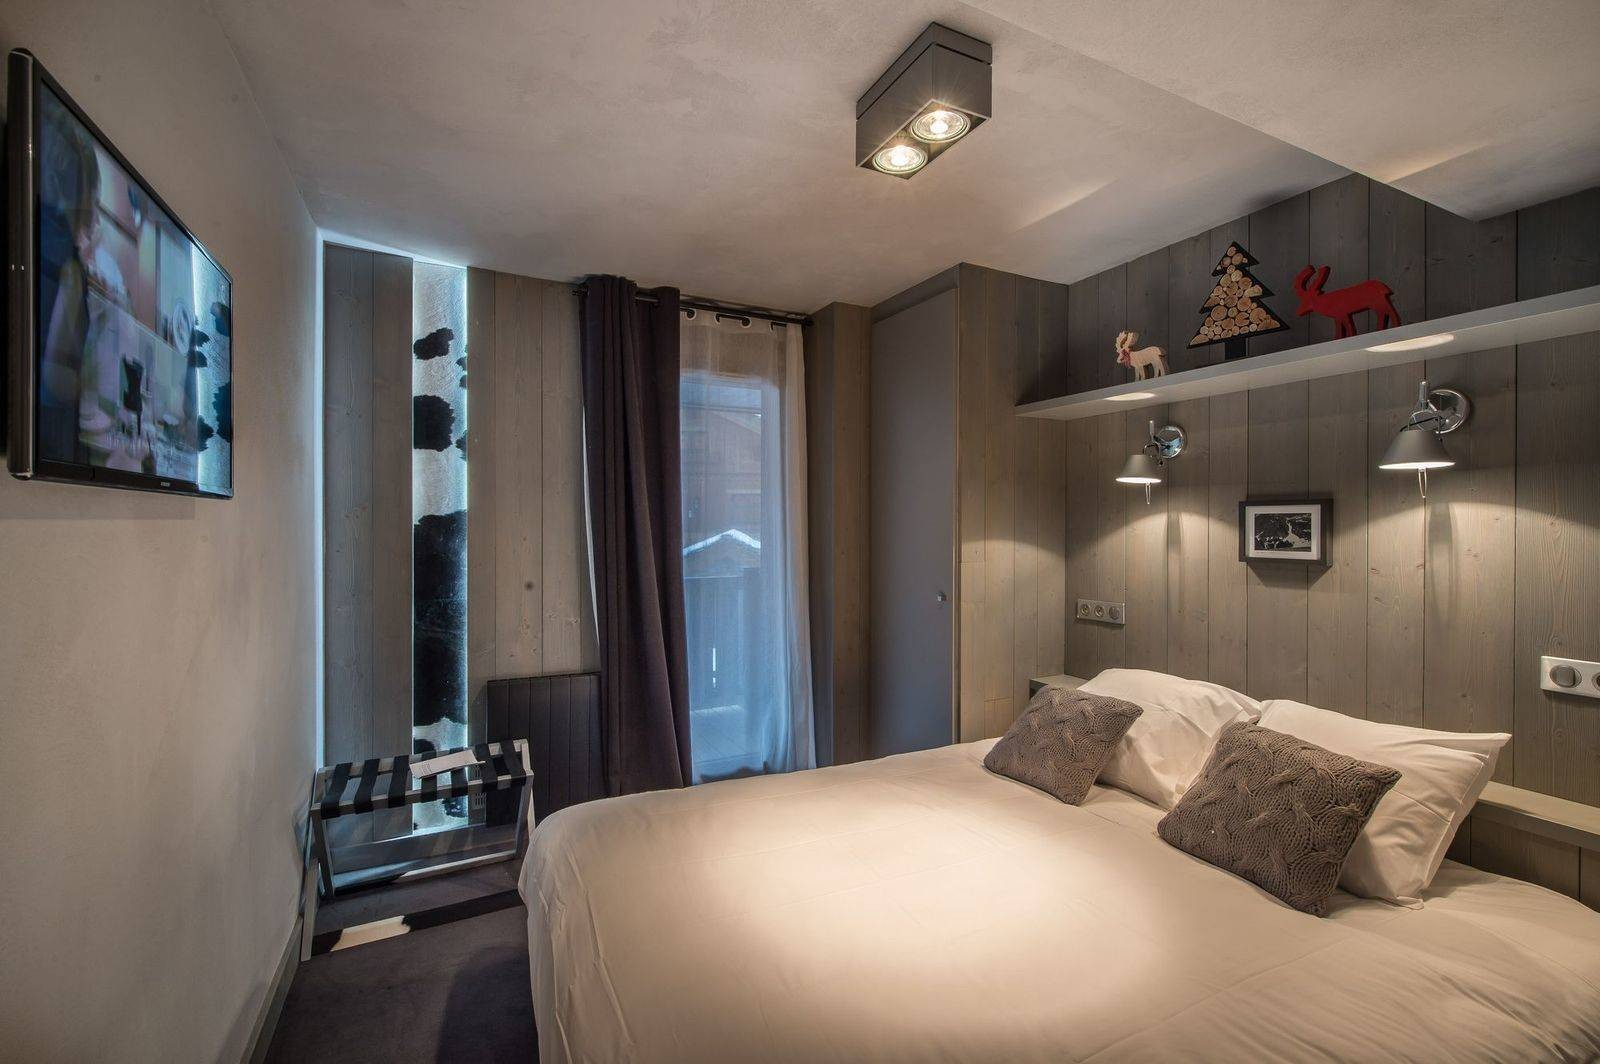 Courchevel 1650 Location Appartement Luxe Simeline Chambre 2